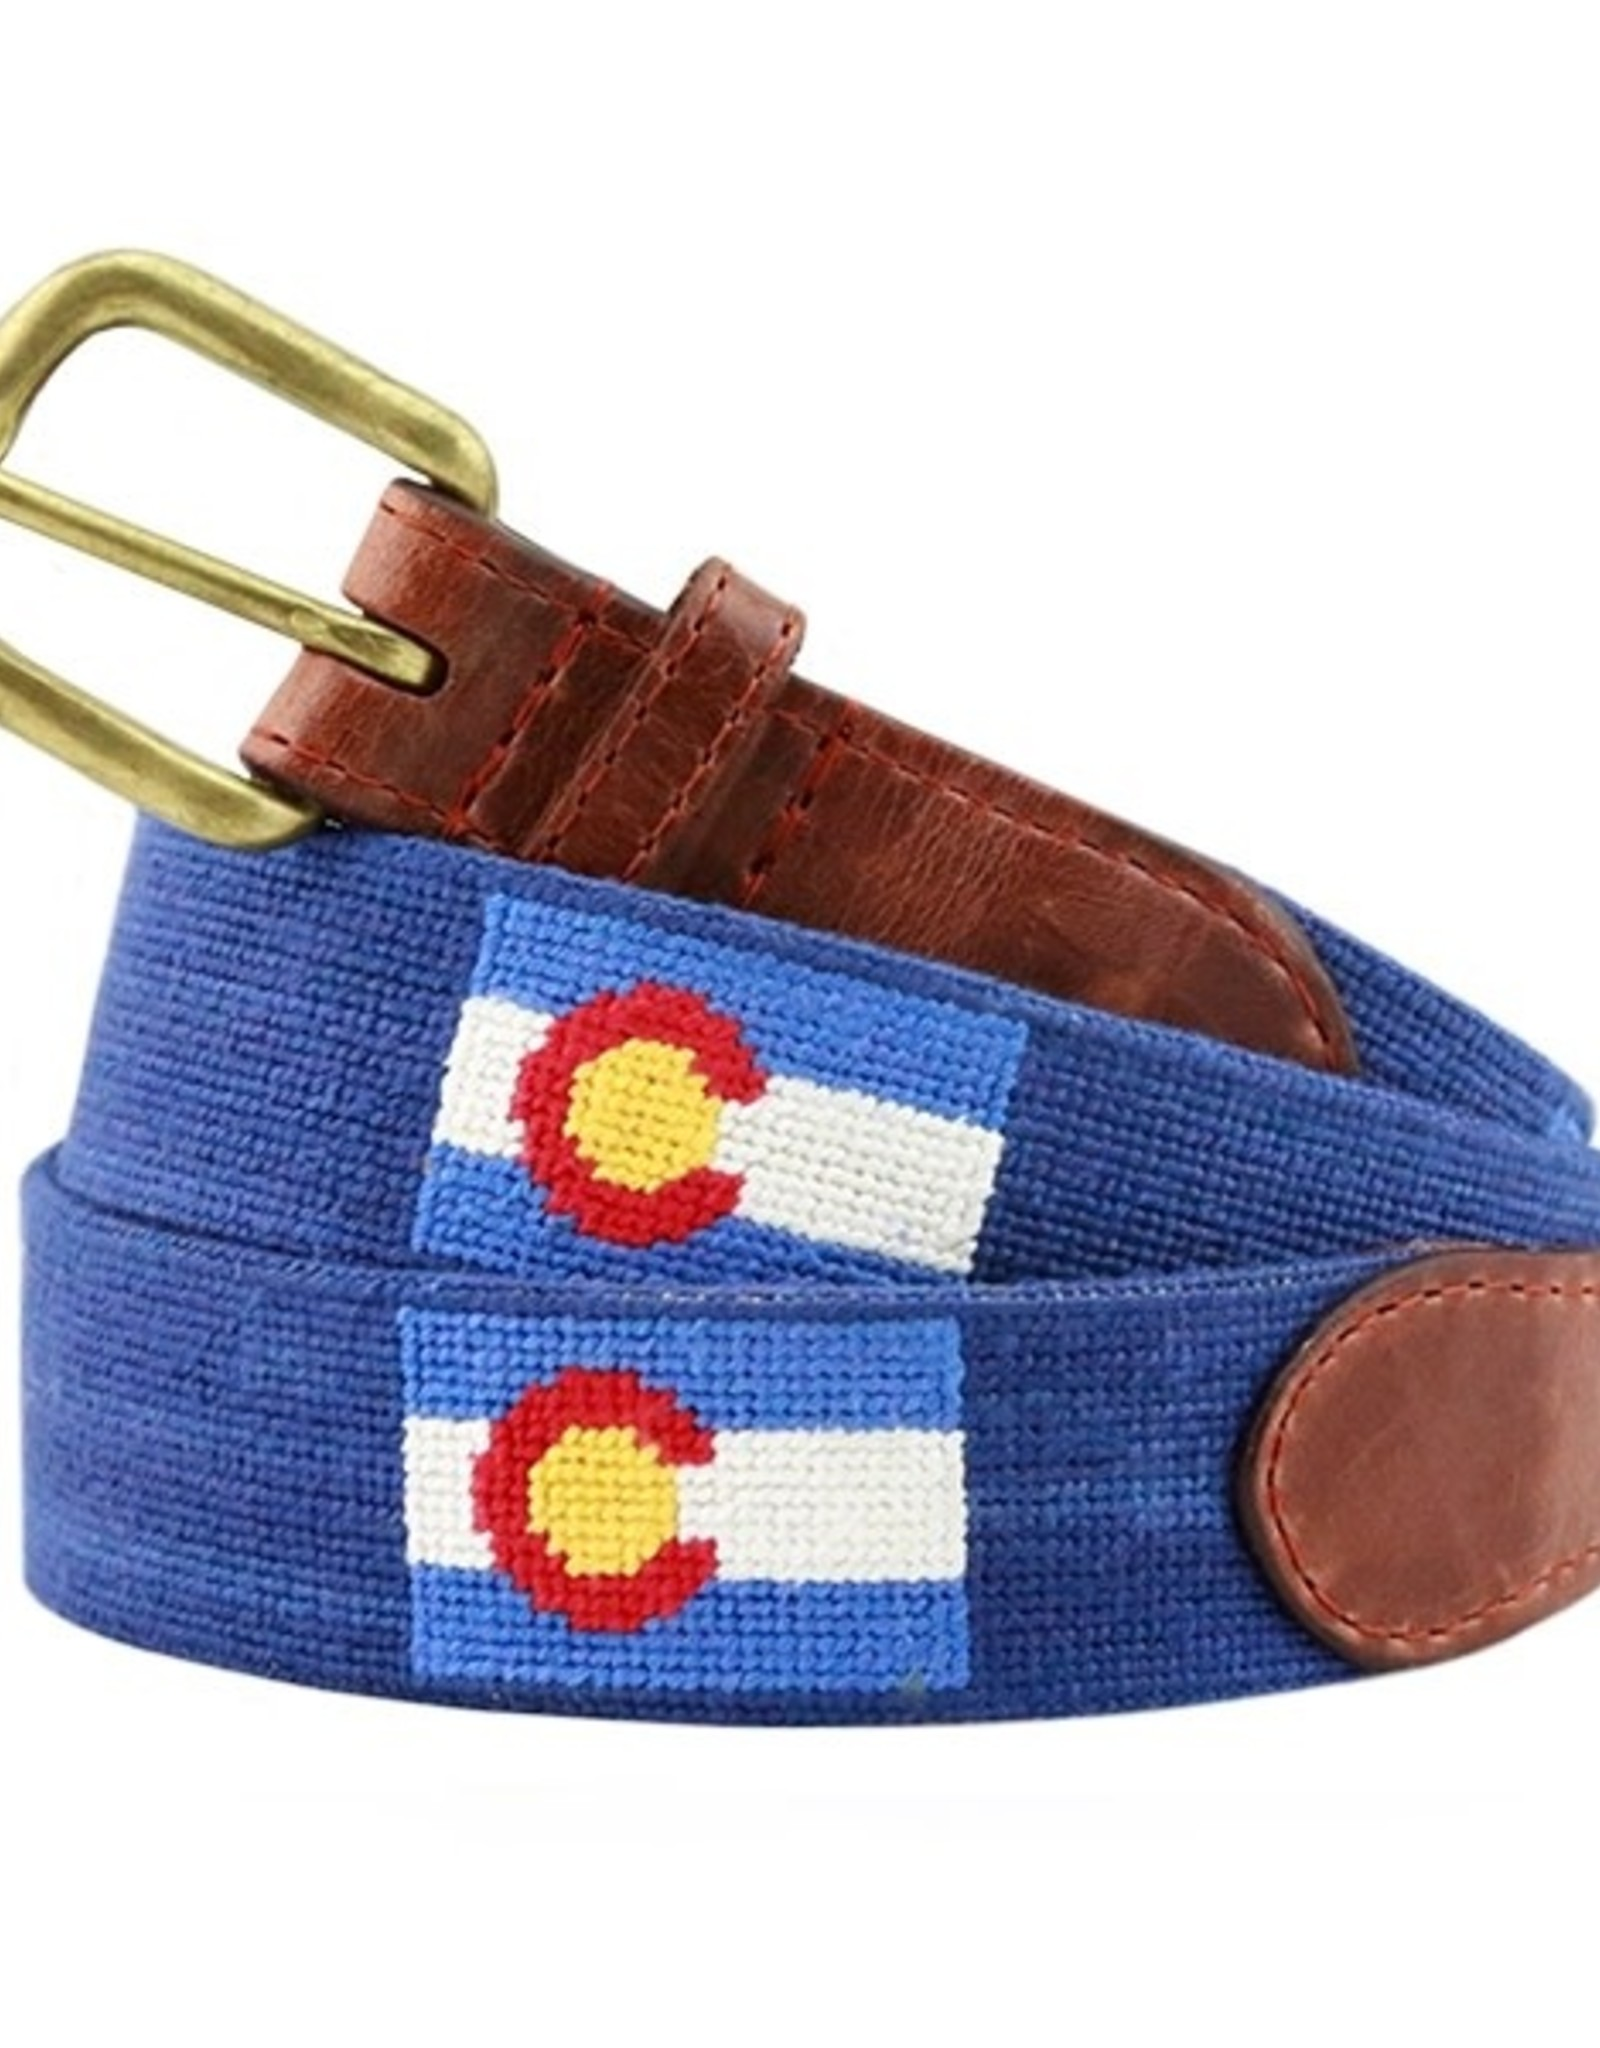 Smather's & Branson Belt Colorado State Flag